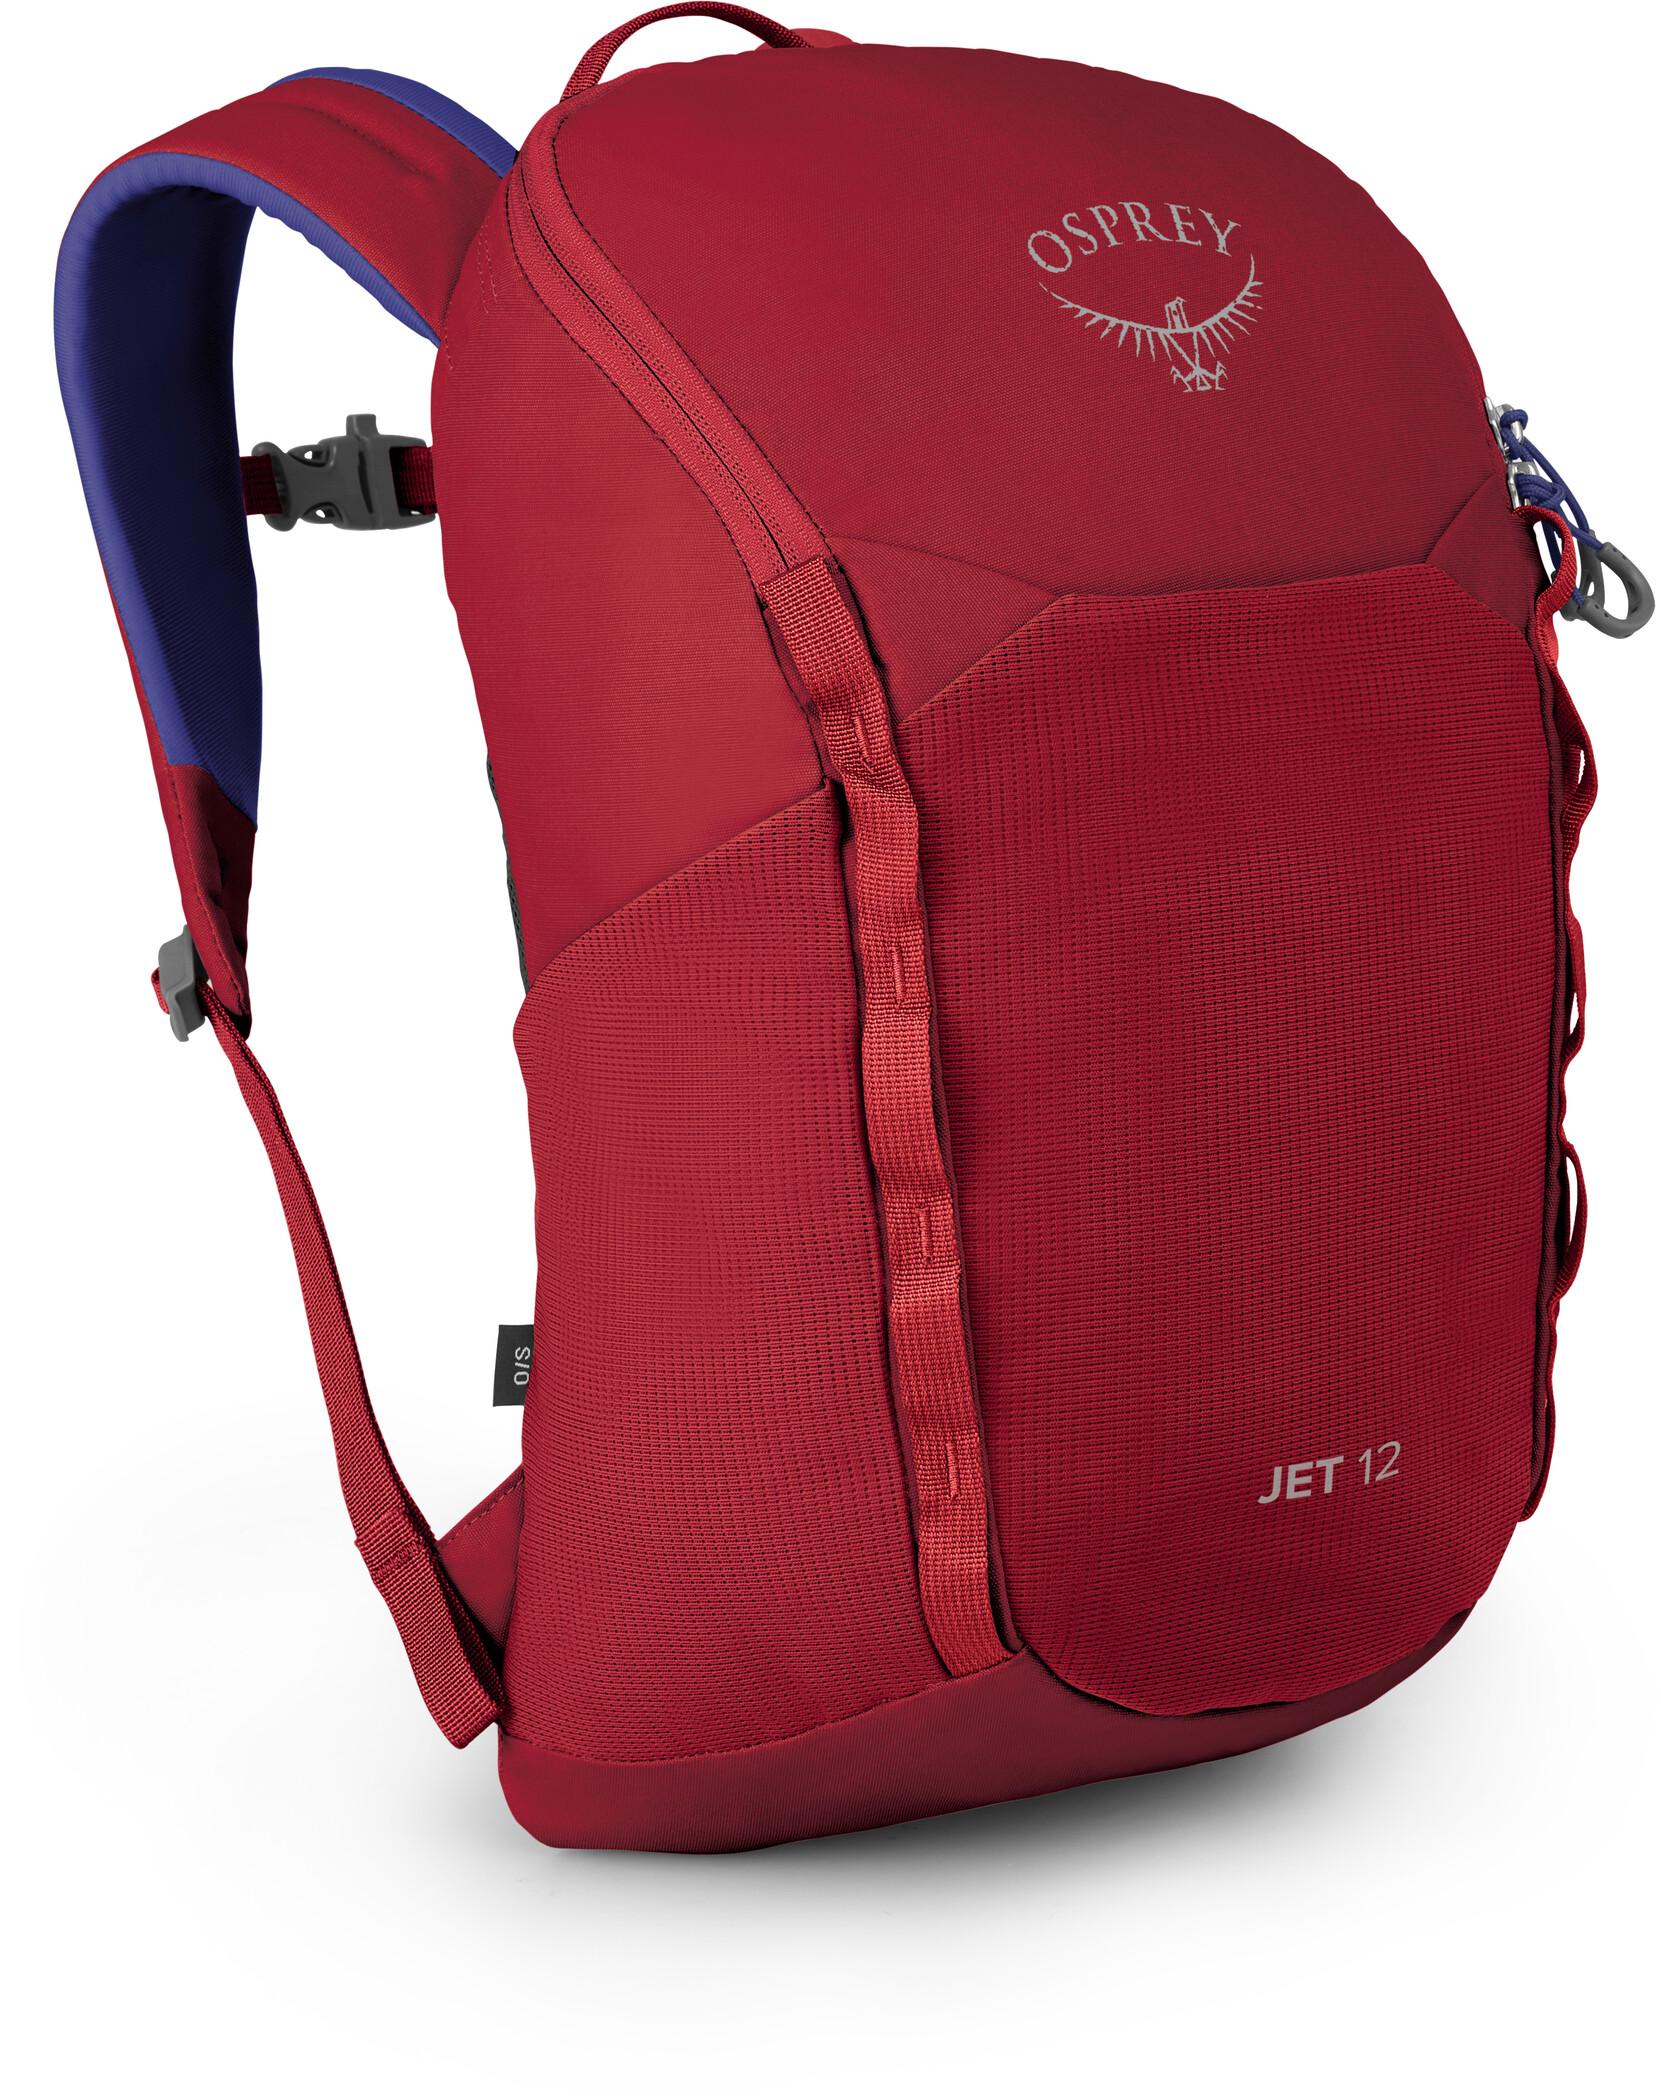 haglöfs tight pro large backpack 30l, Haglöfs GRAM COMP